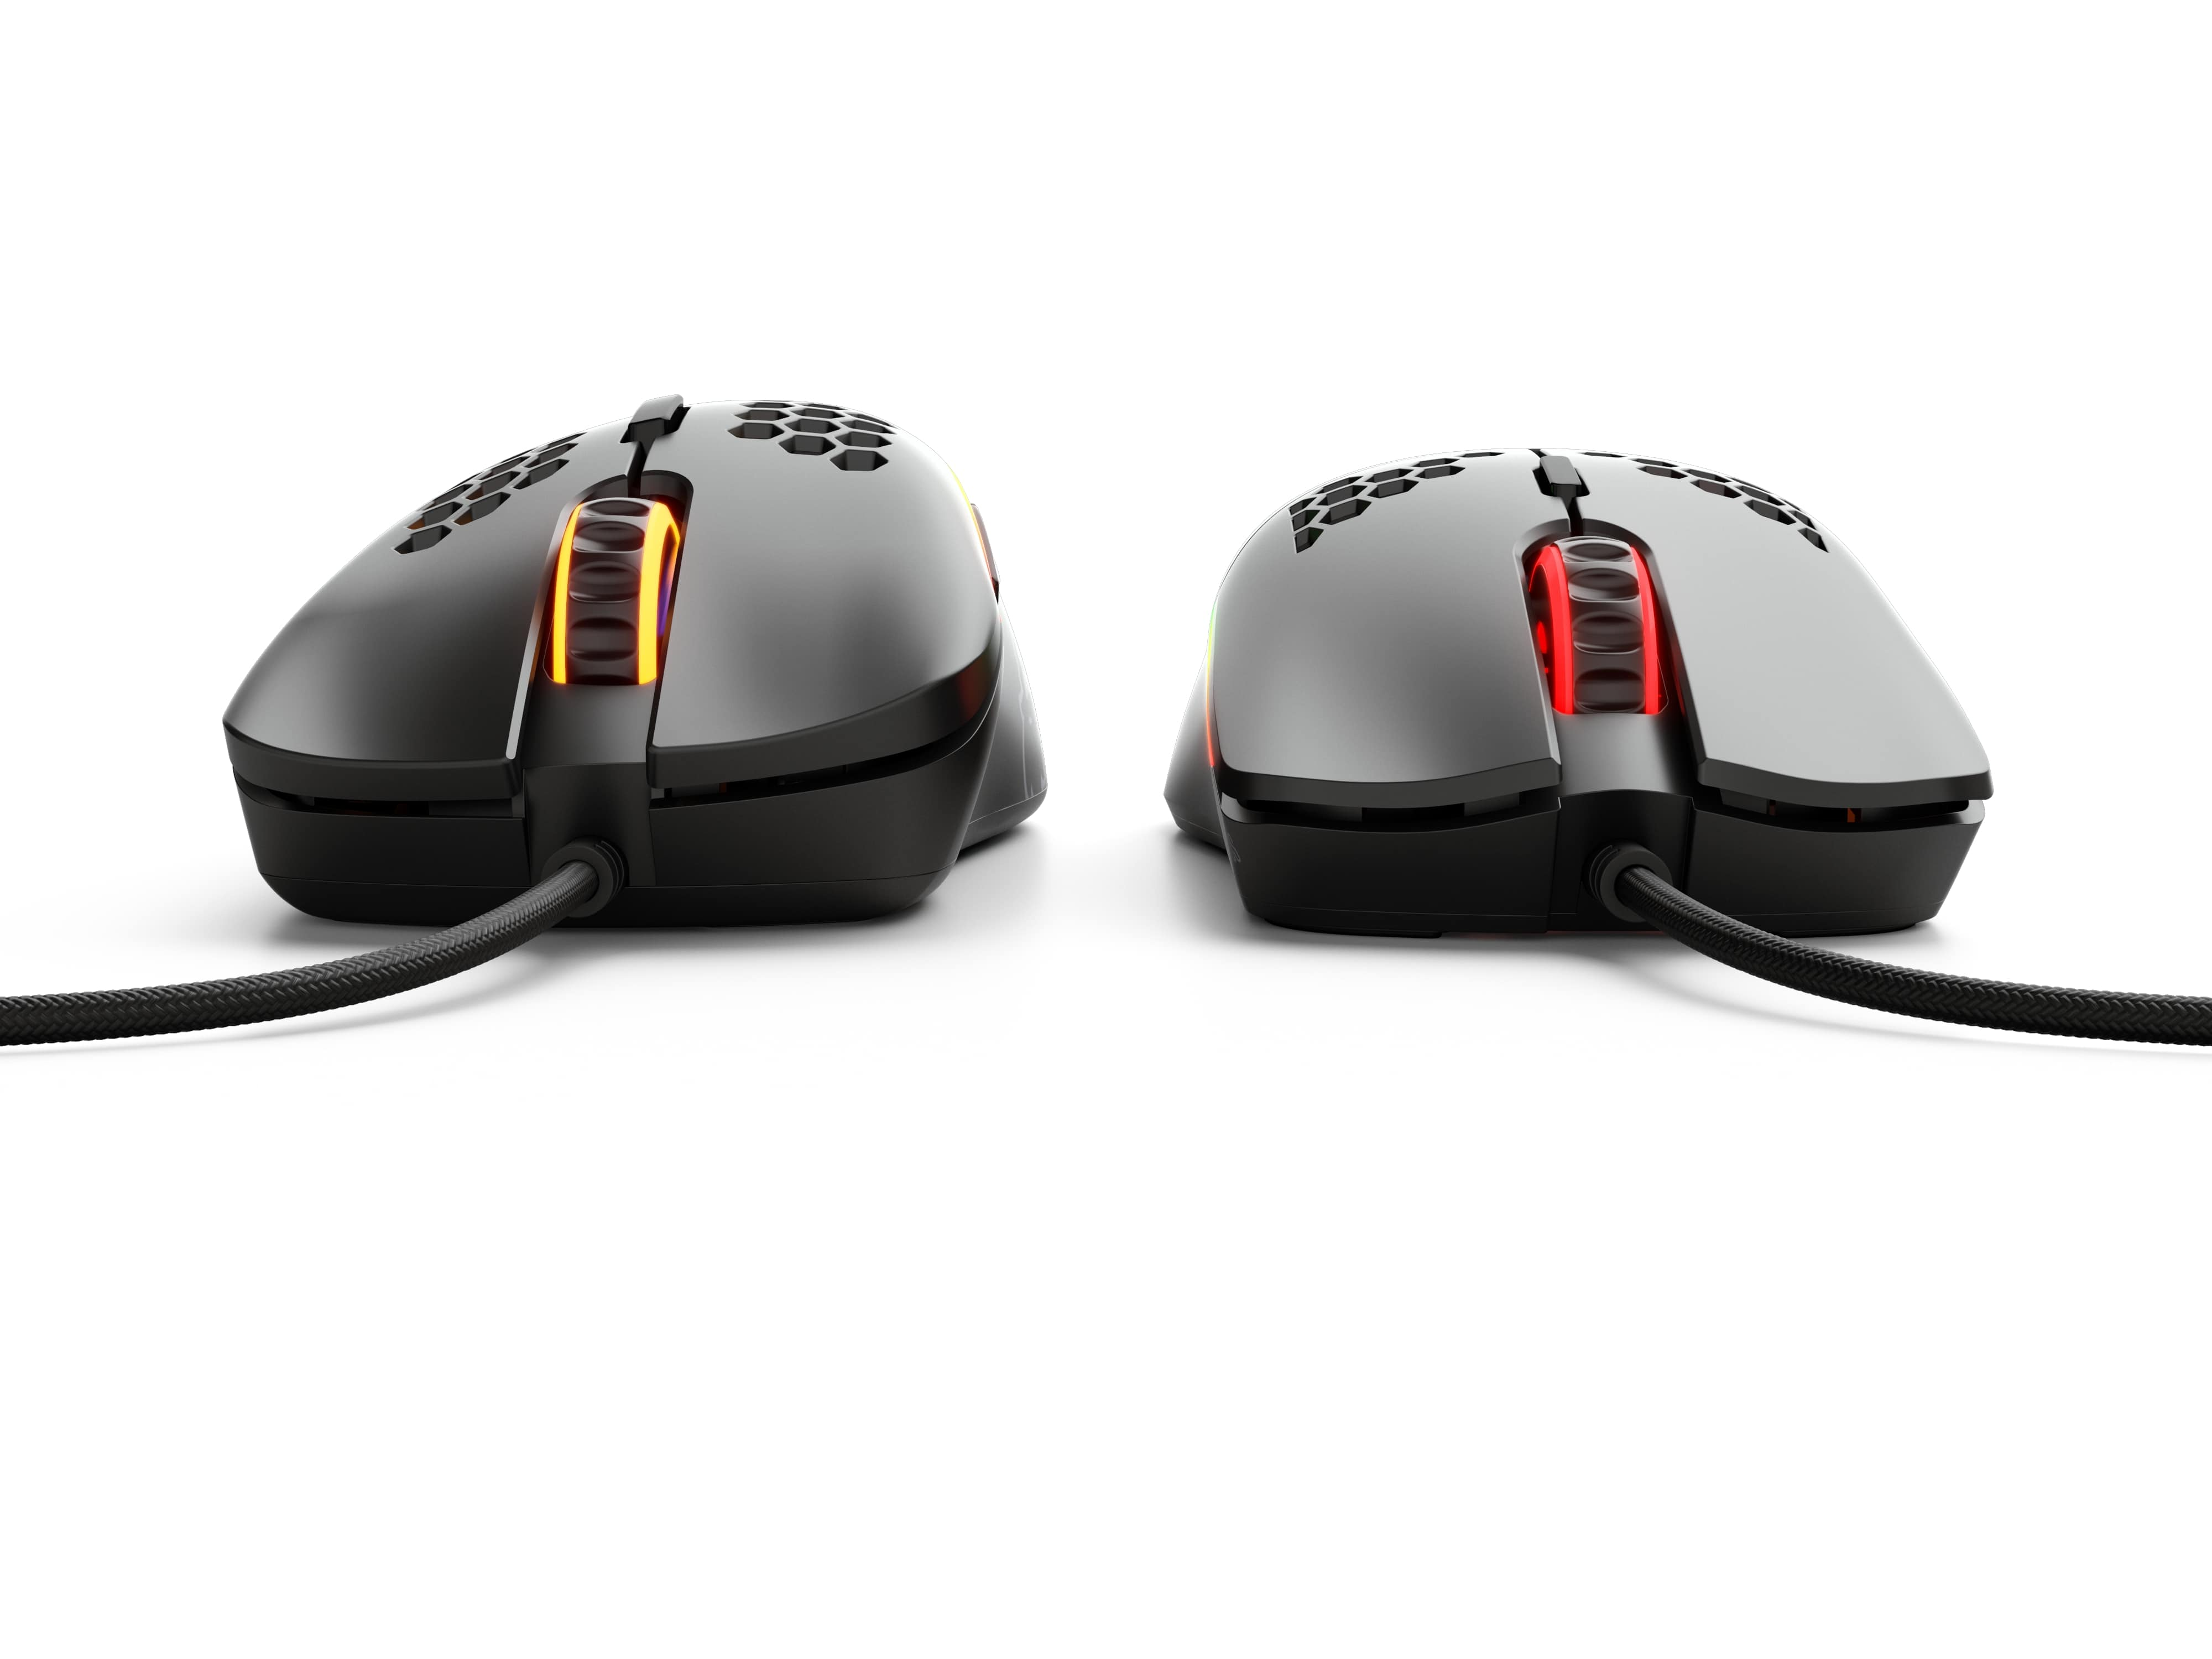 Egér Glorious PC Gaming Race Model D- RGB Optikai USB Fehér